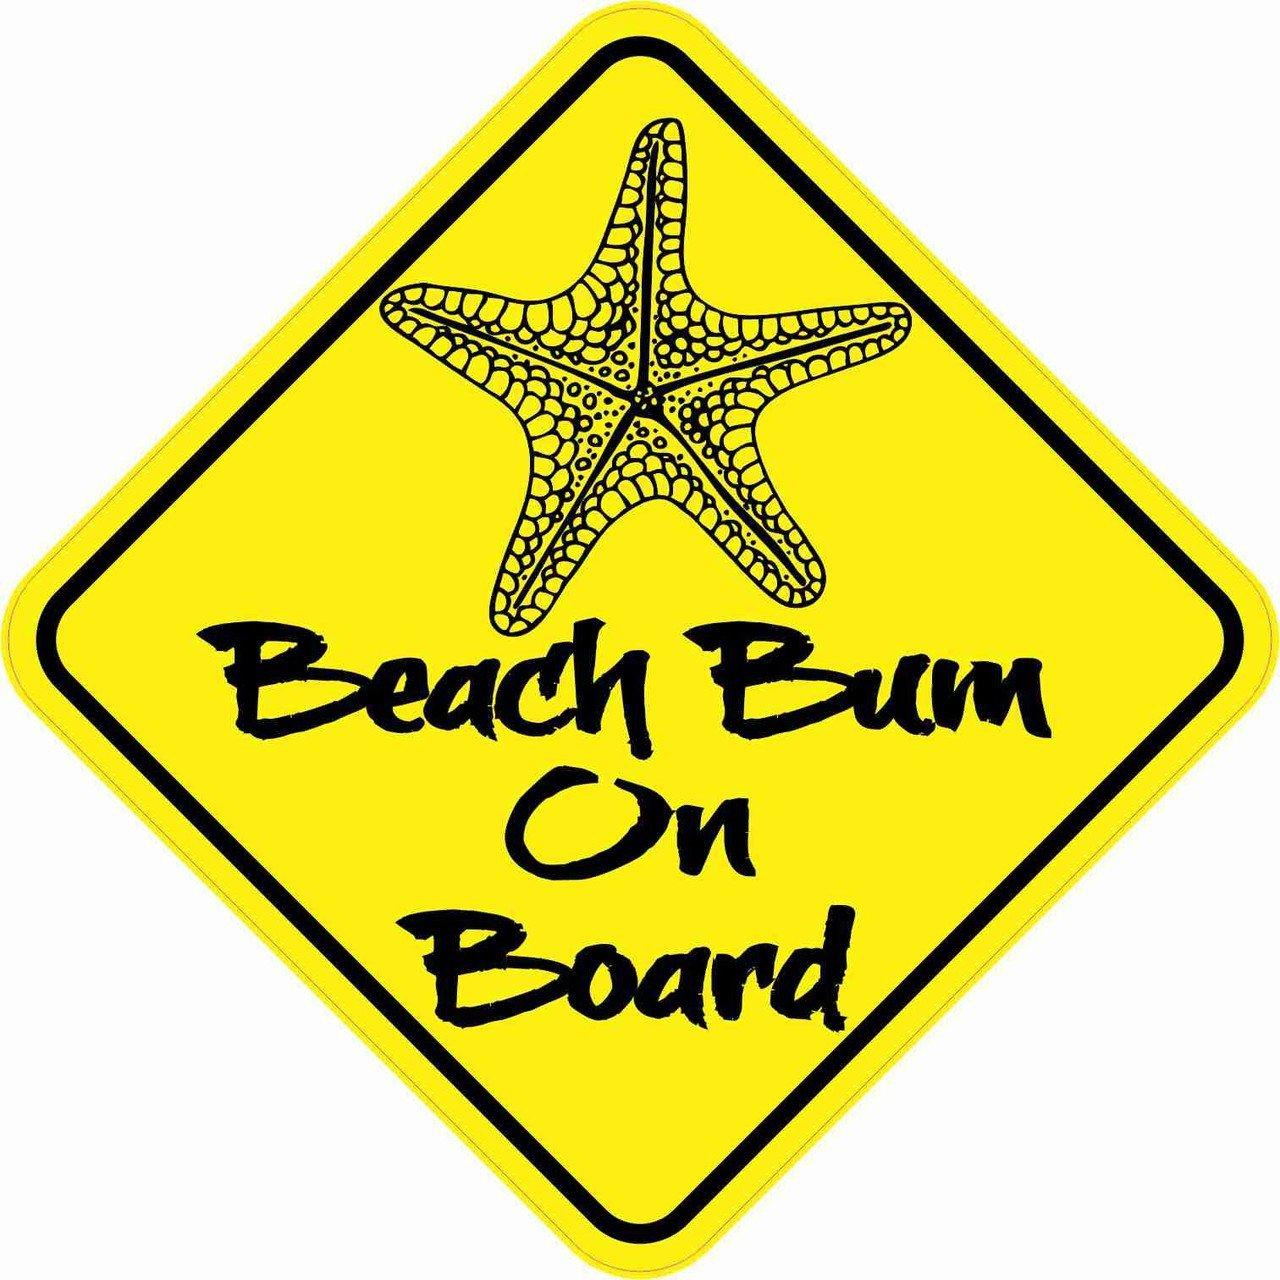 Beach Bum On Board Magnet